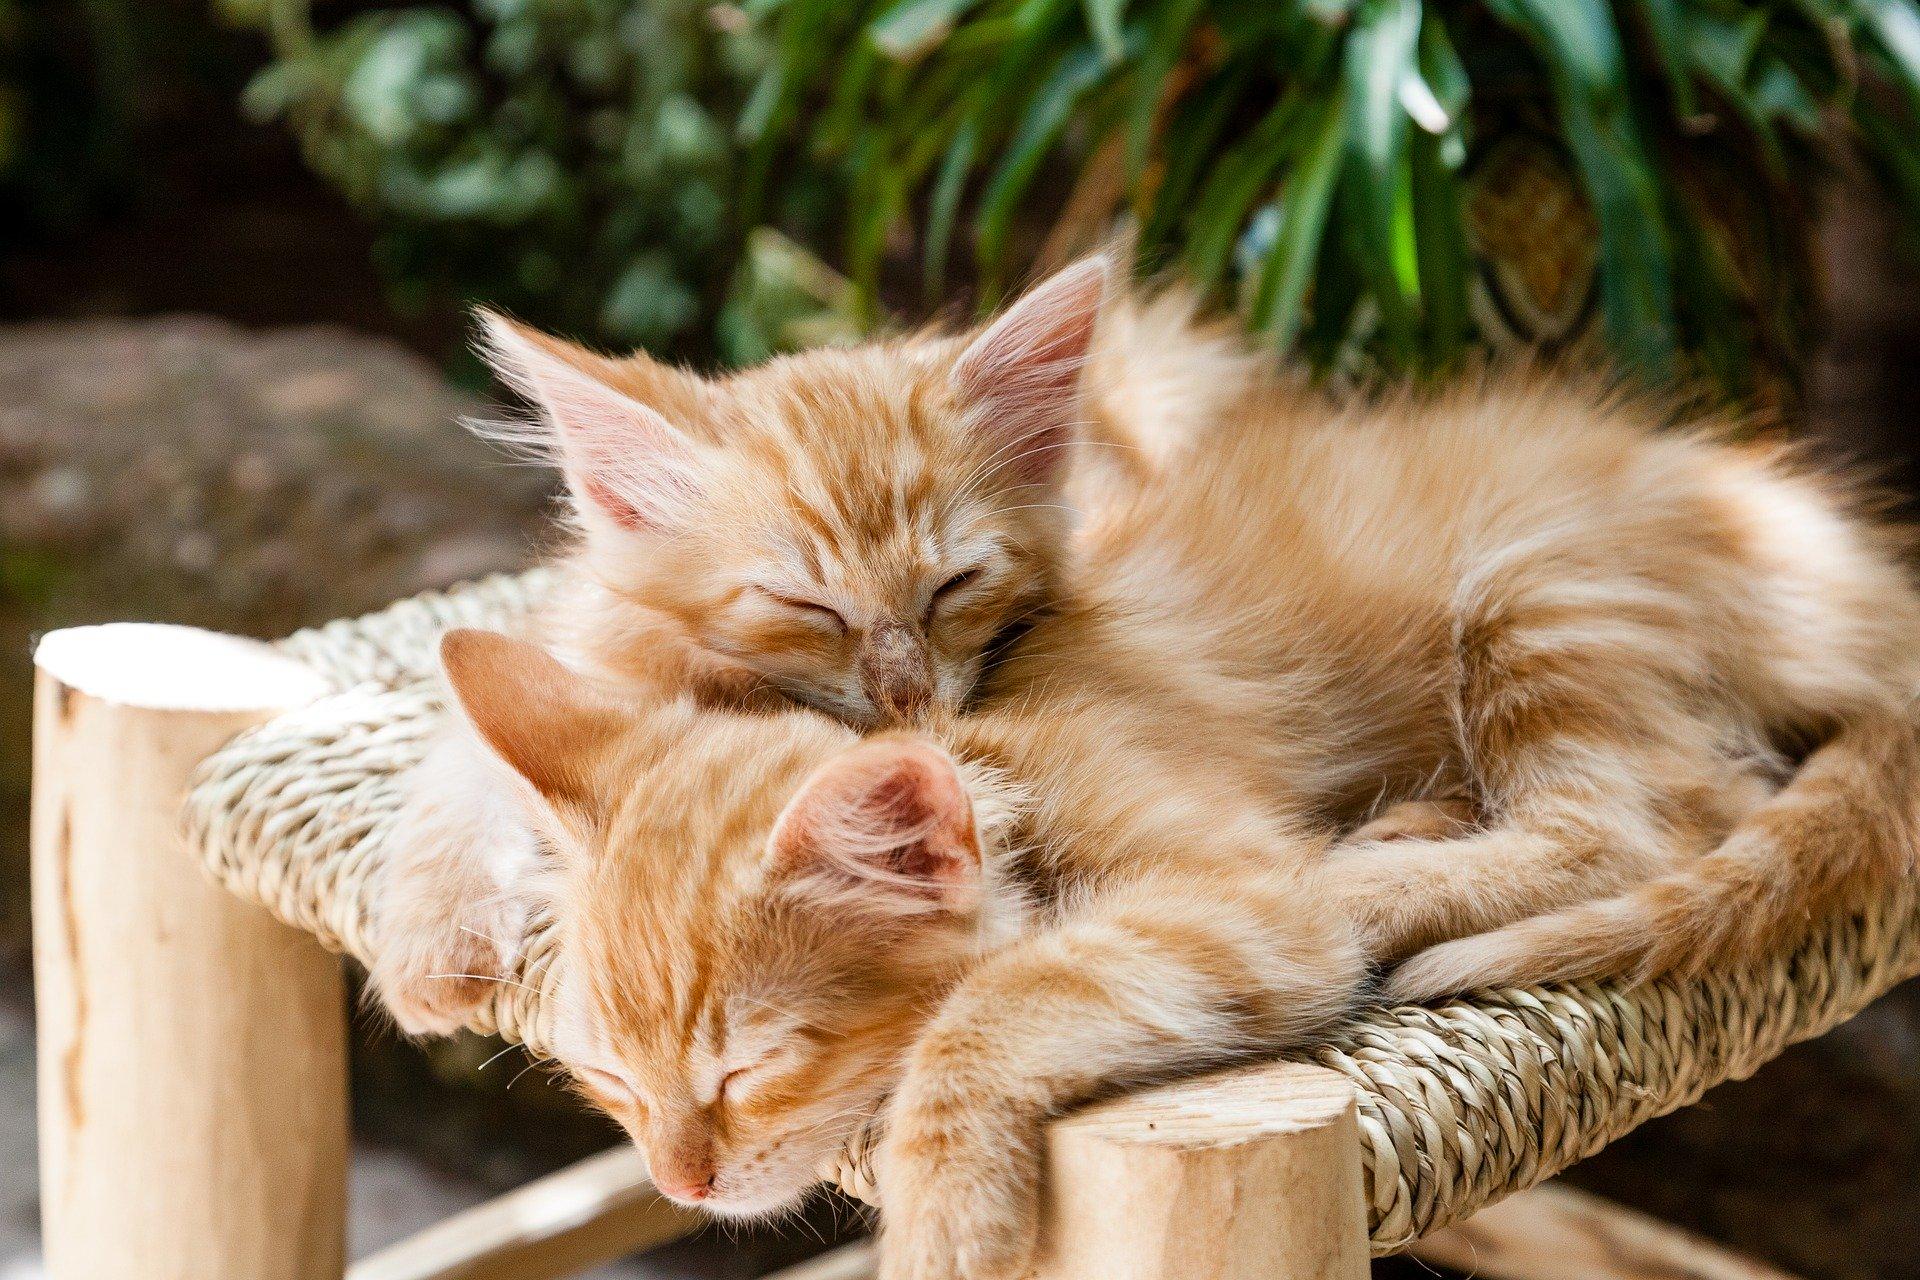 La muerte súbita en gatos causa mucho dolor a la familia